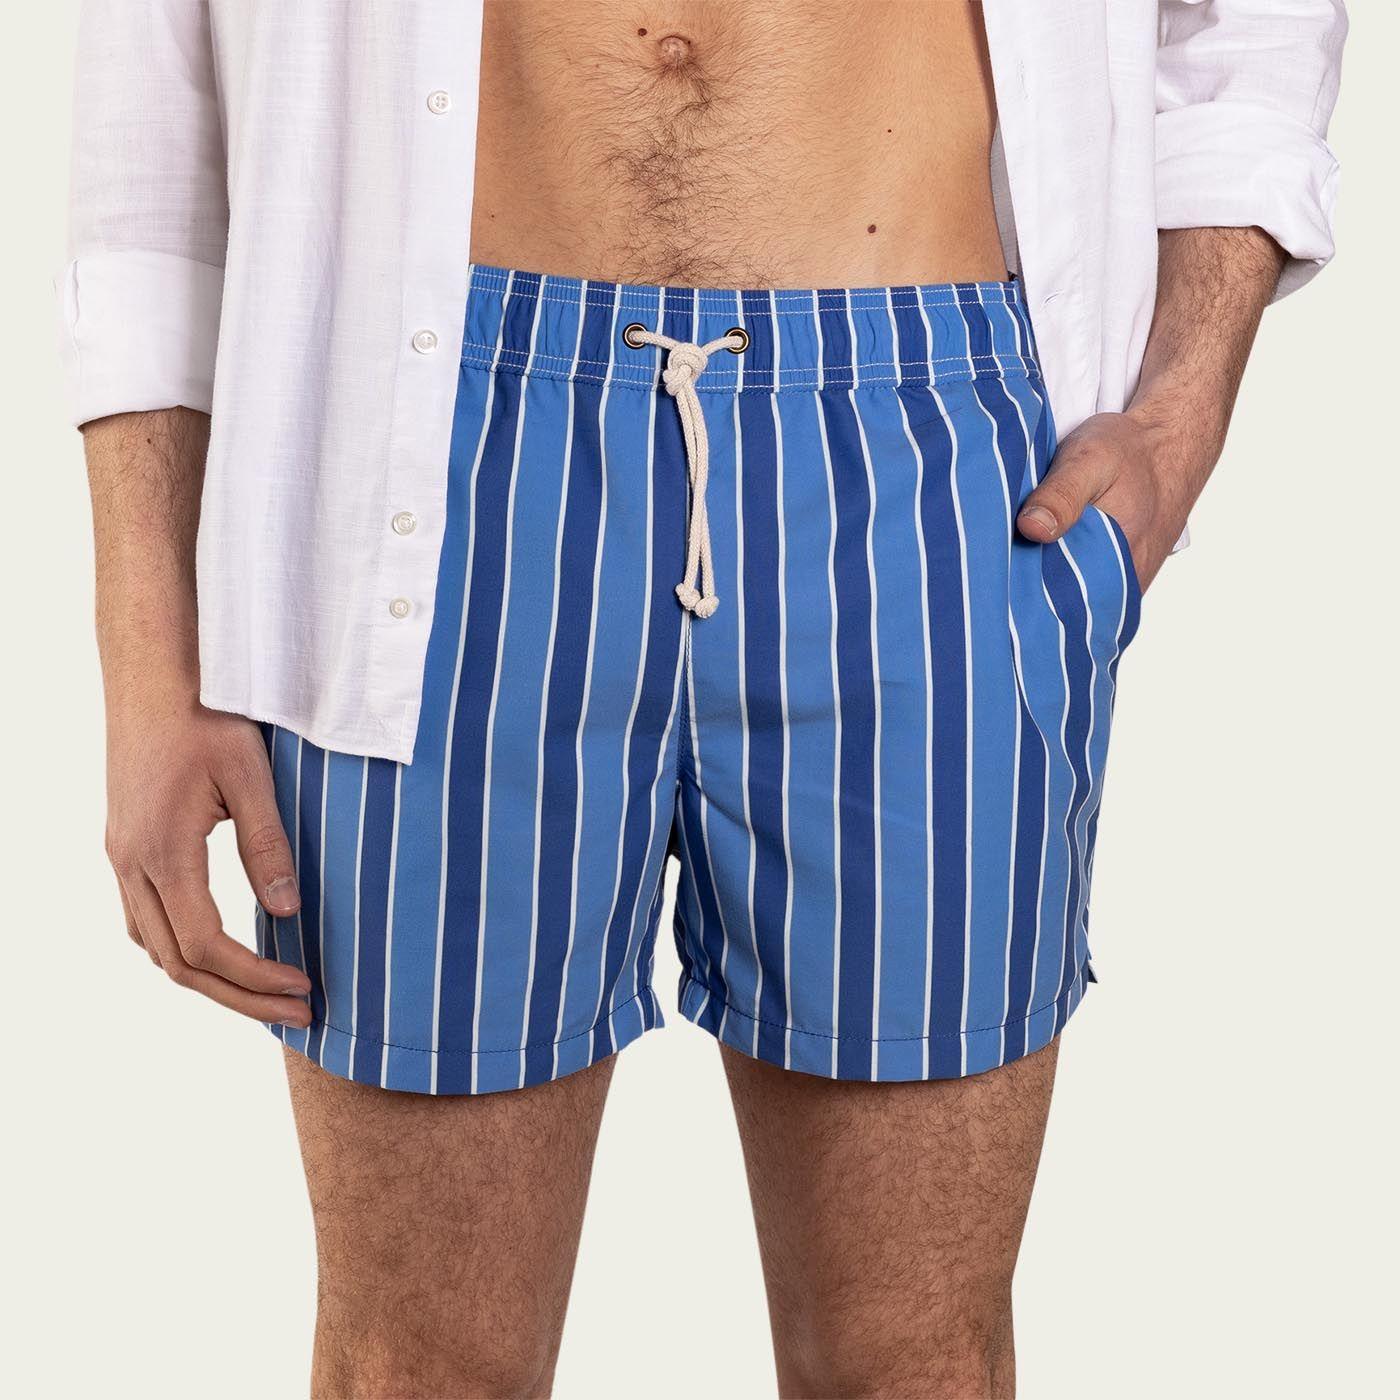 Monterosso Celeste/Blu Swim Short  | Bombinate